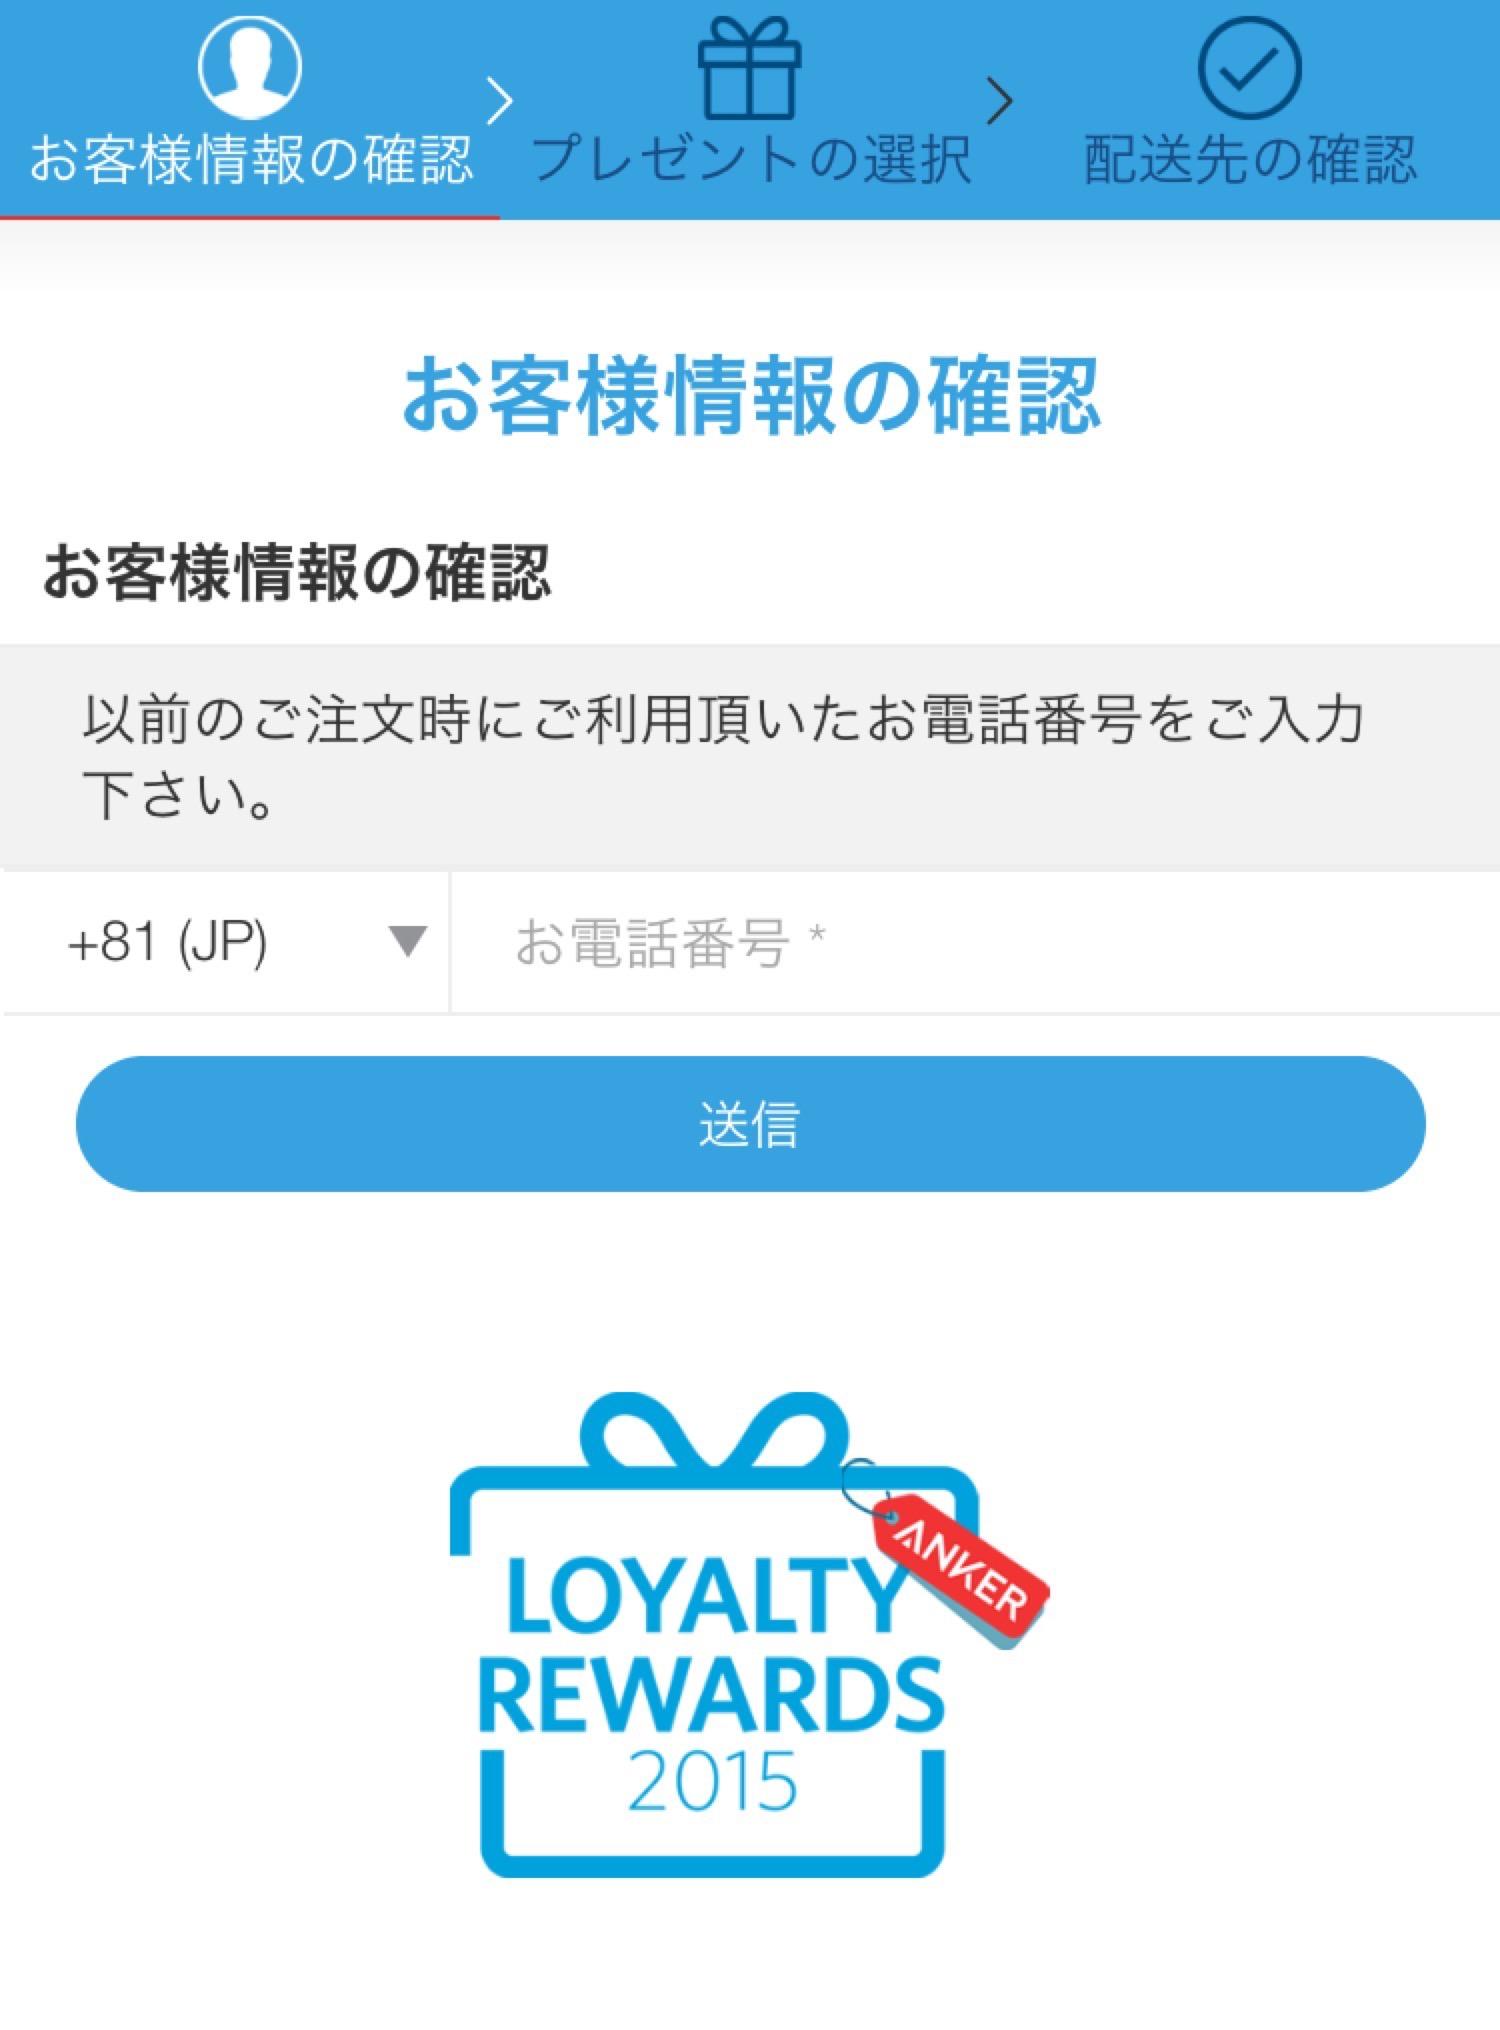 Anker reward20156